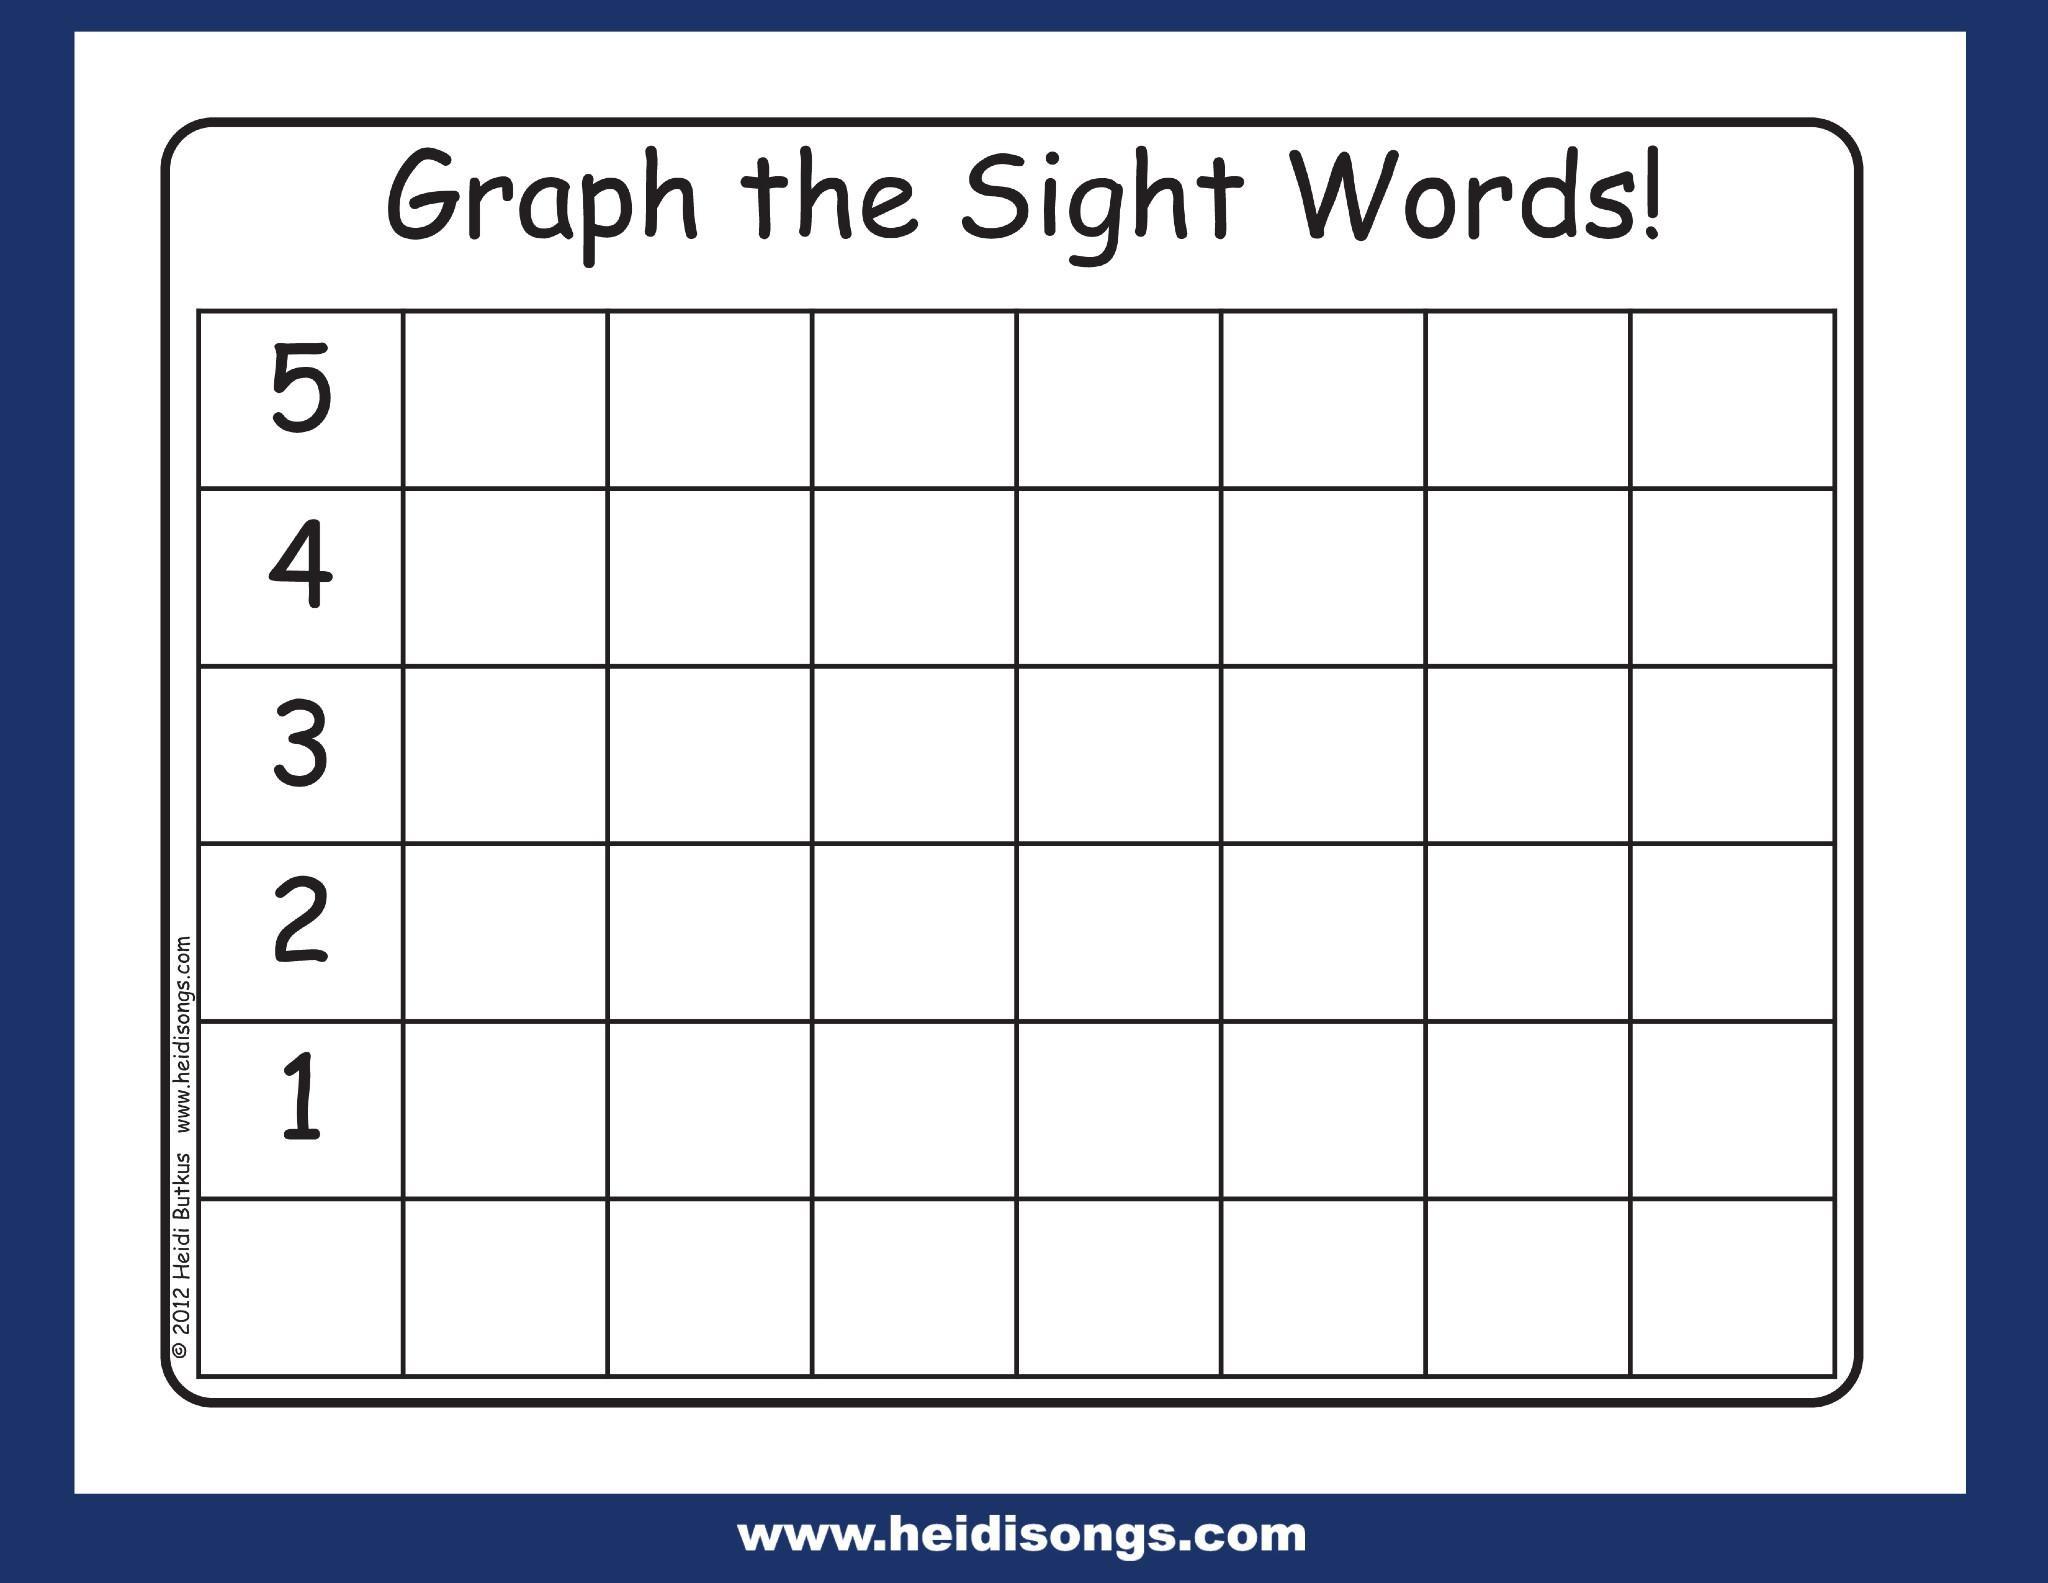 Free Printable Blank Graph Worksheets 5 Letter Worksheets